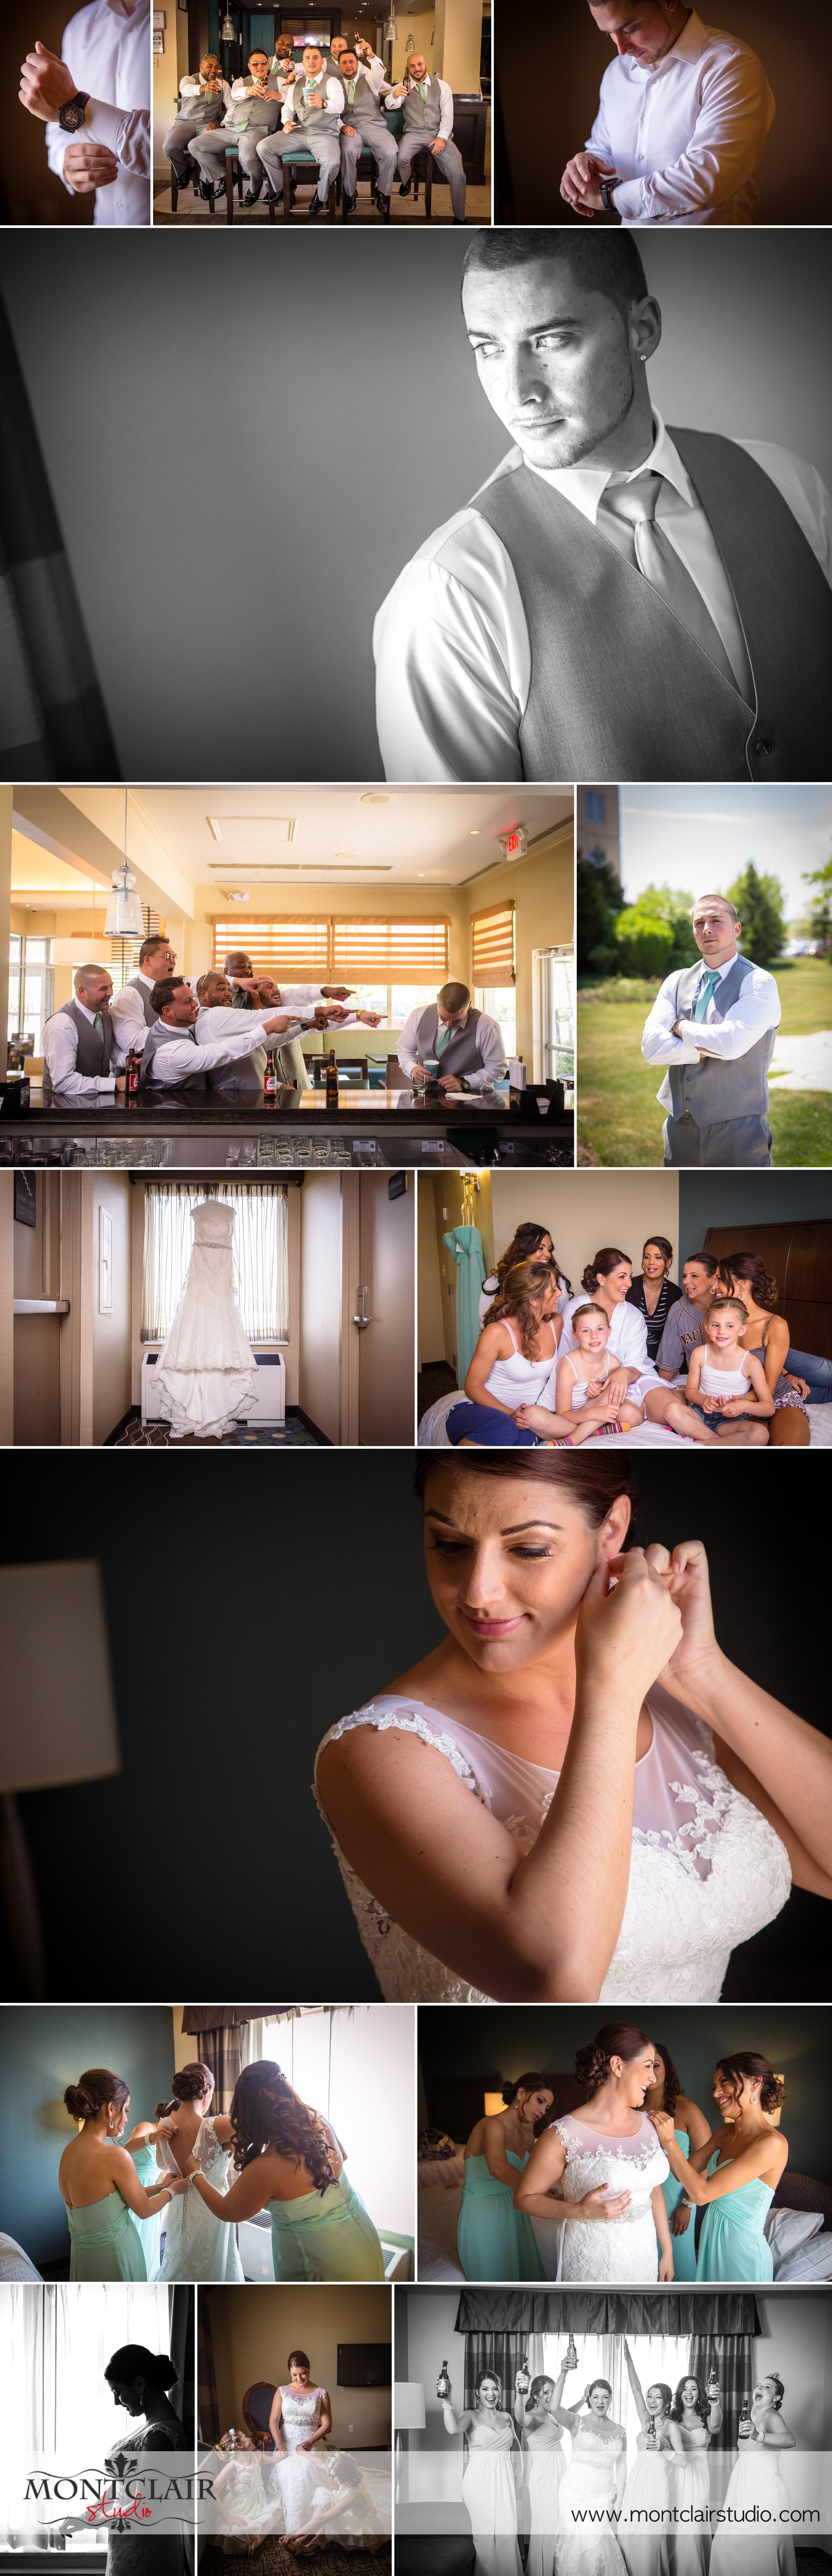 Wedding Katelyn Adeelar 1.jpg